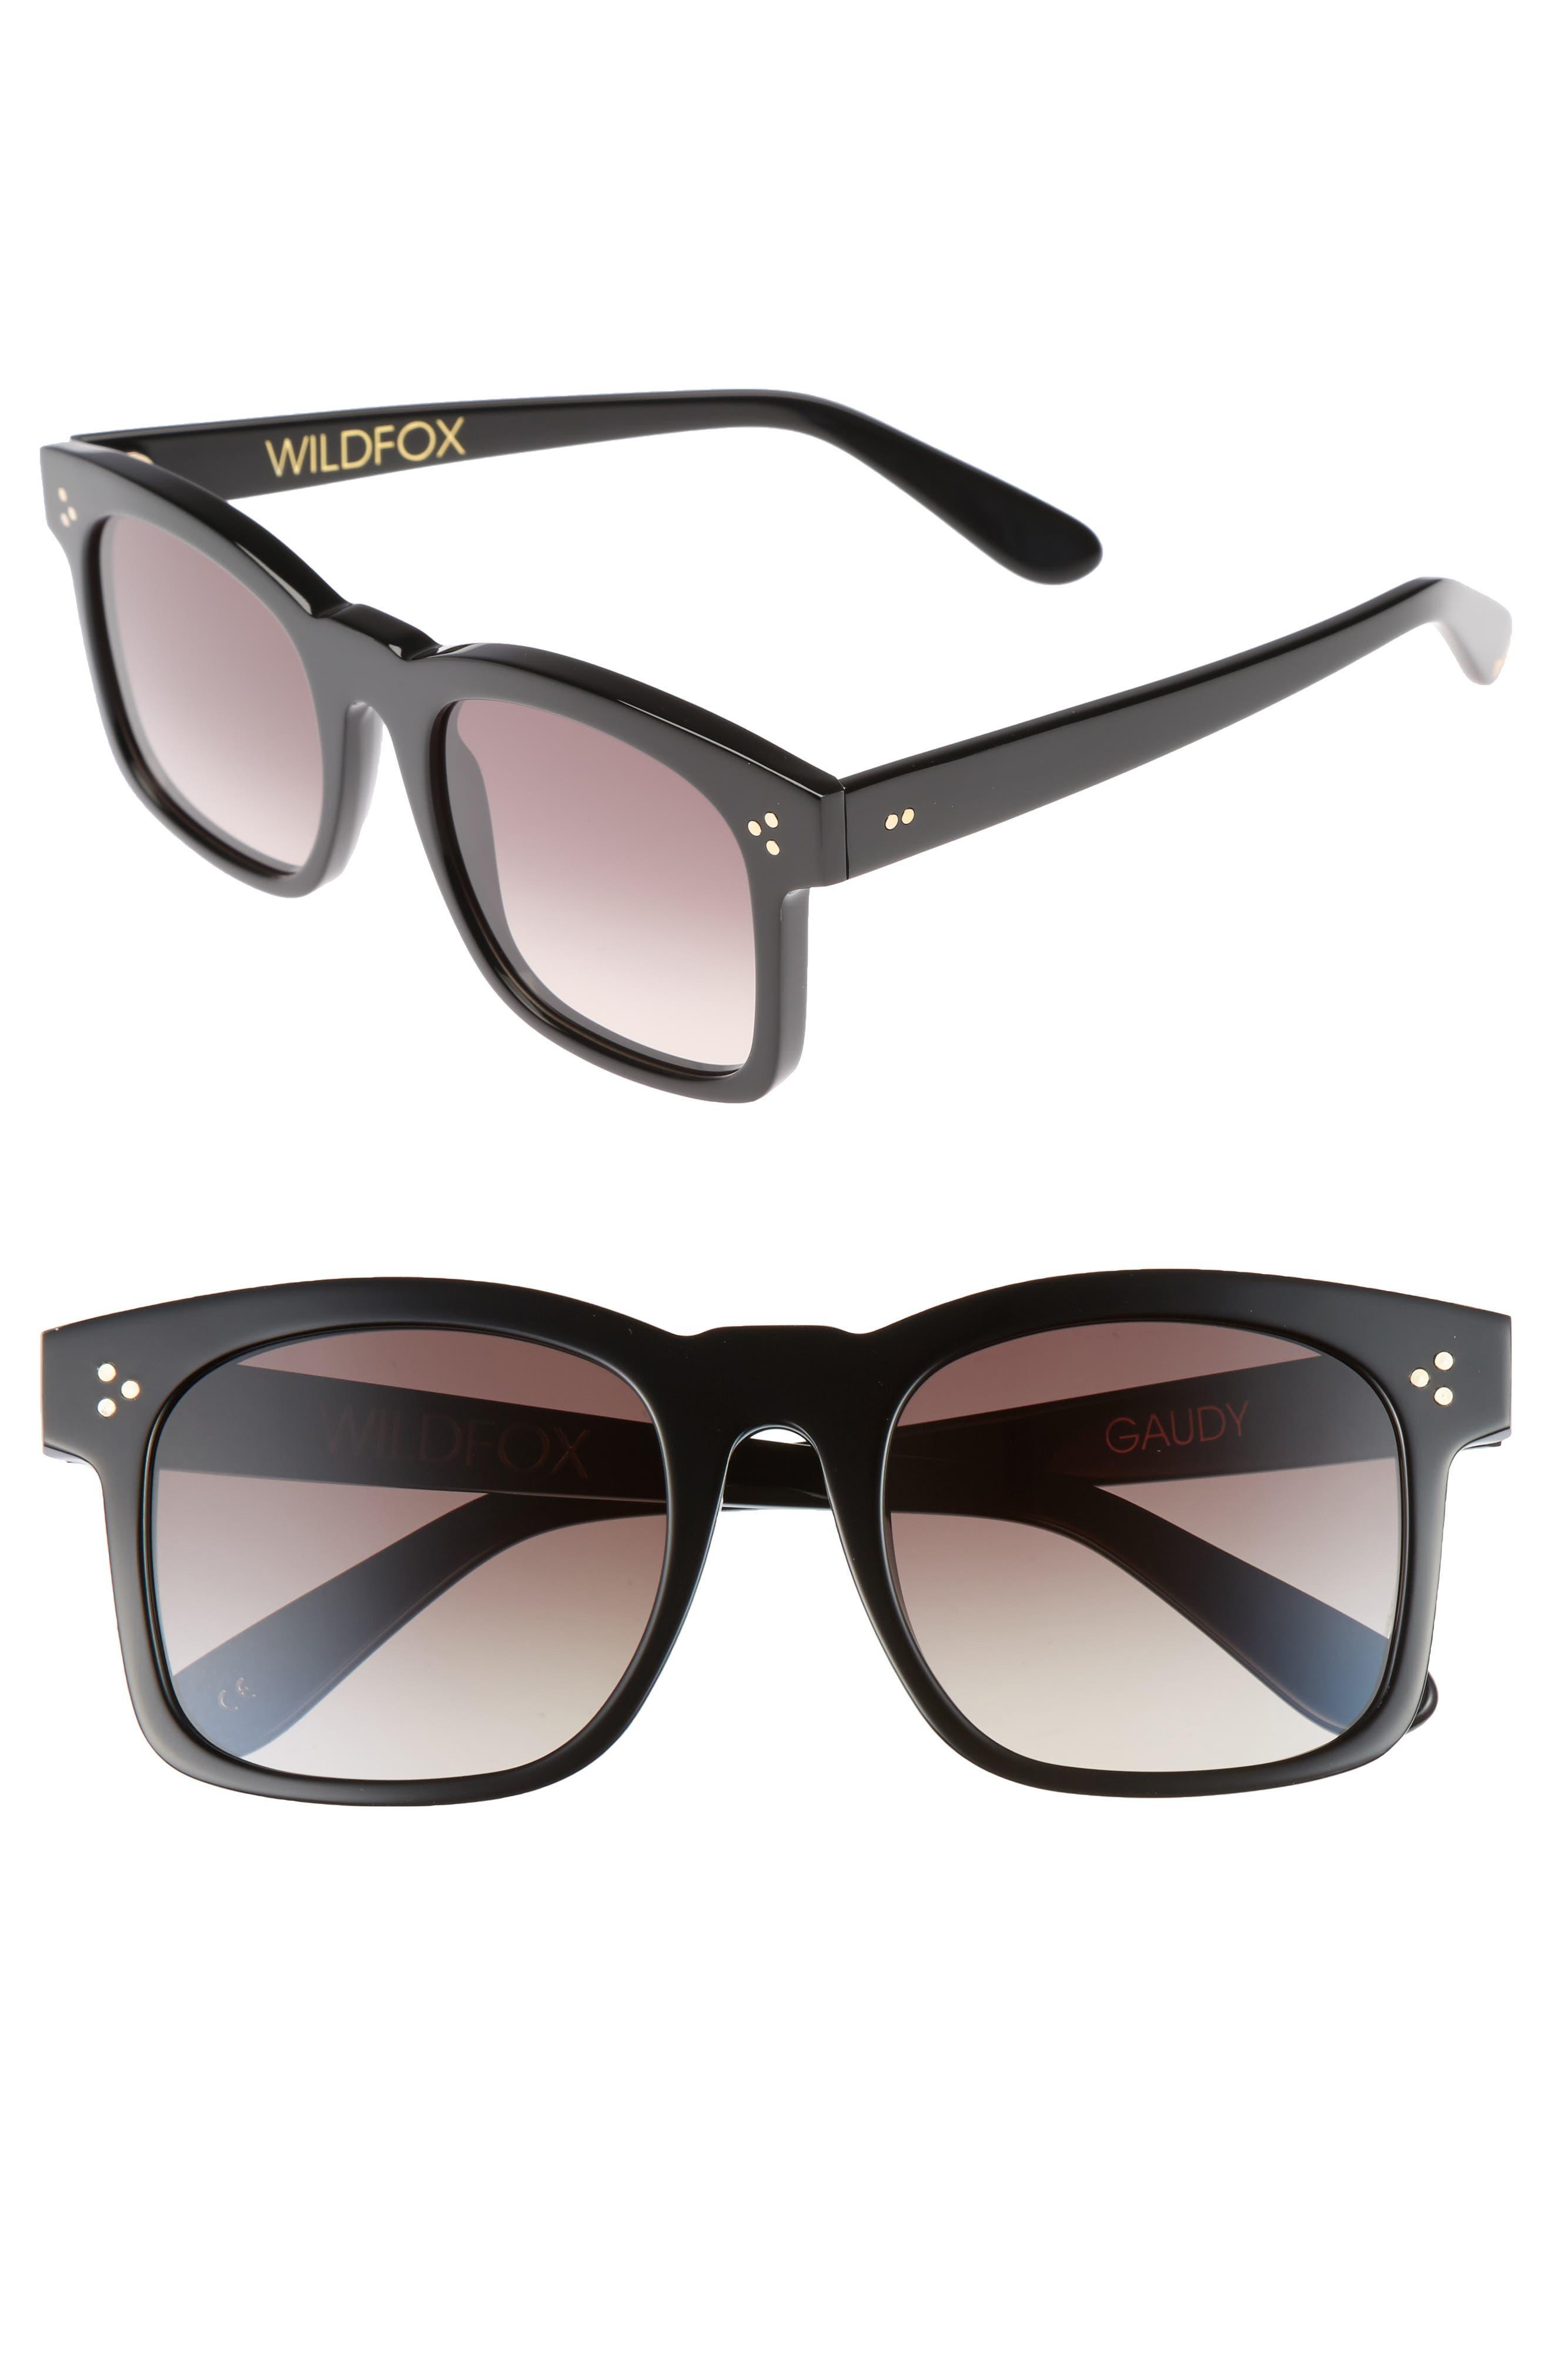 Gaudy Zero 51mm Flat Square Sunglasses,                         Main,                         color, Black